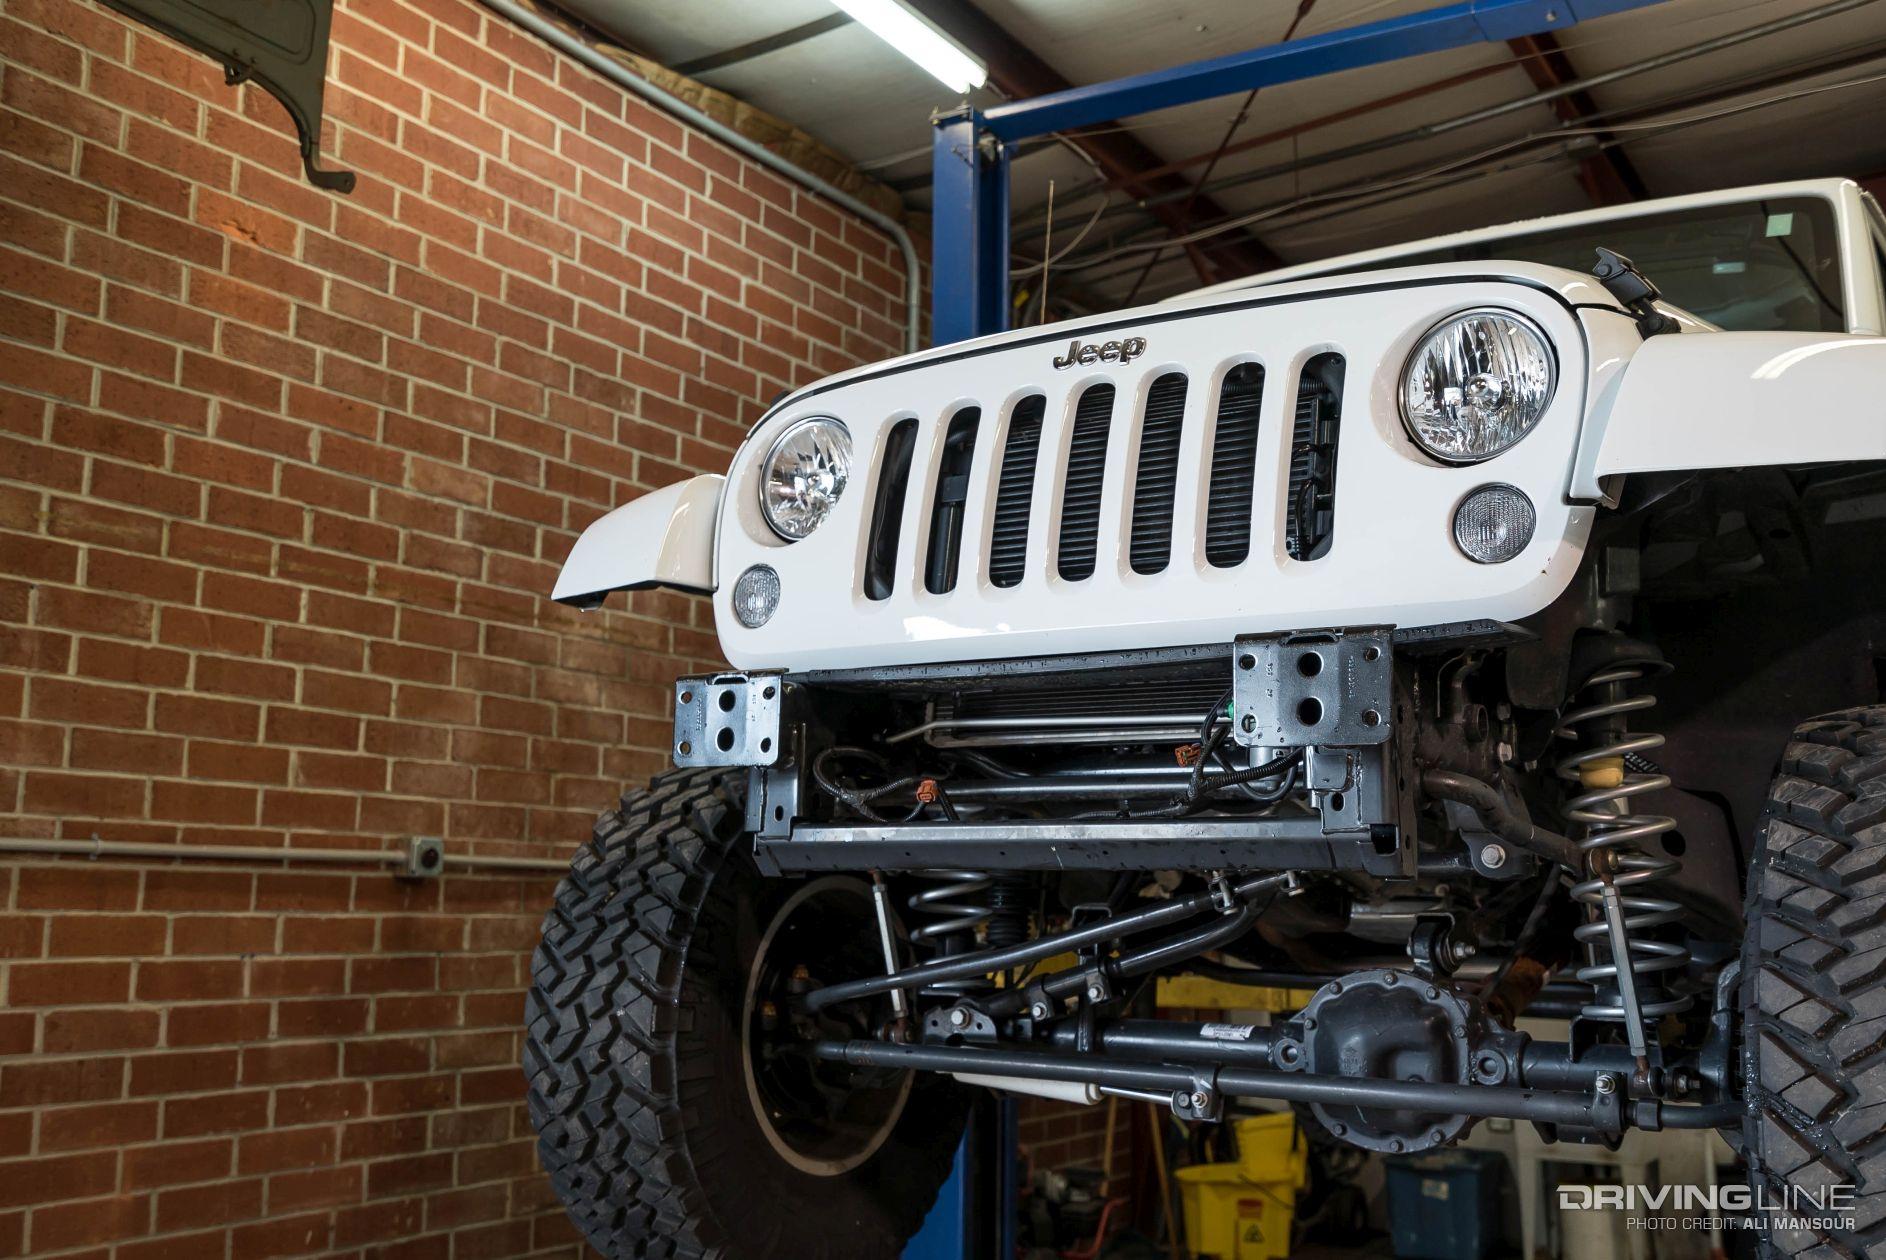 fab fours jeep wrangler jk lifestyle front winch bumper review rh drivingline com Jeep Wrangler Fender Flares Jeep Wrangler Front Fenders